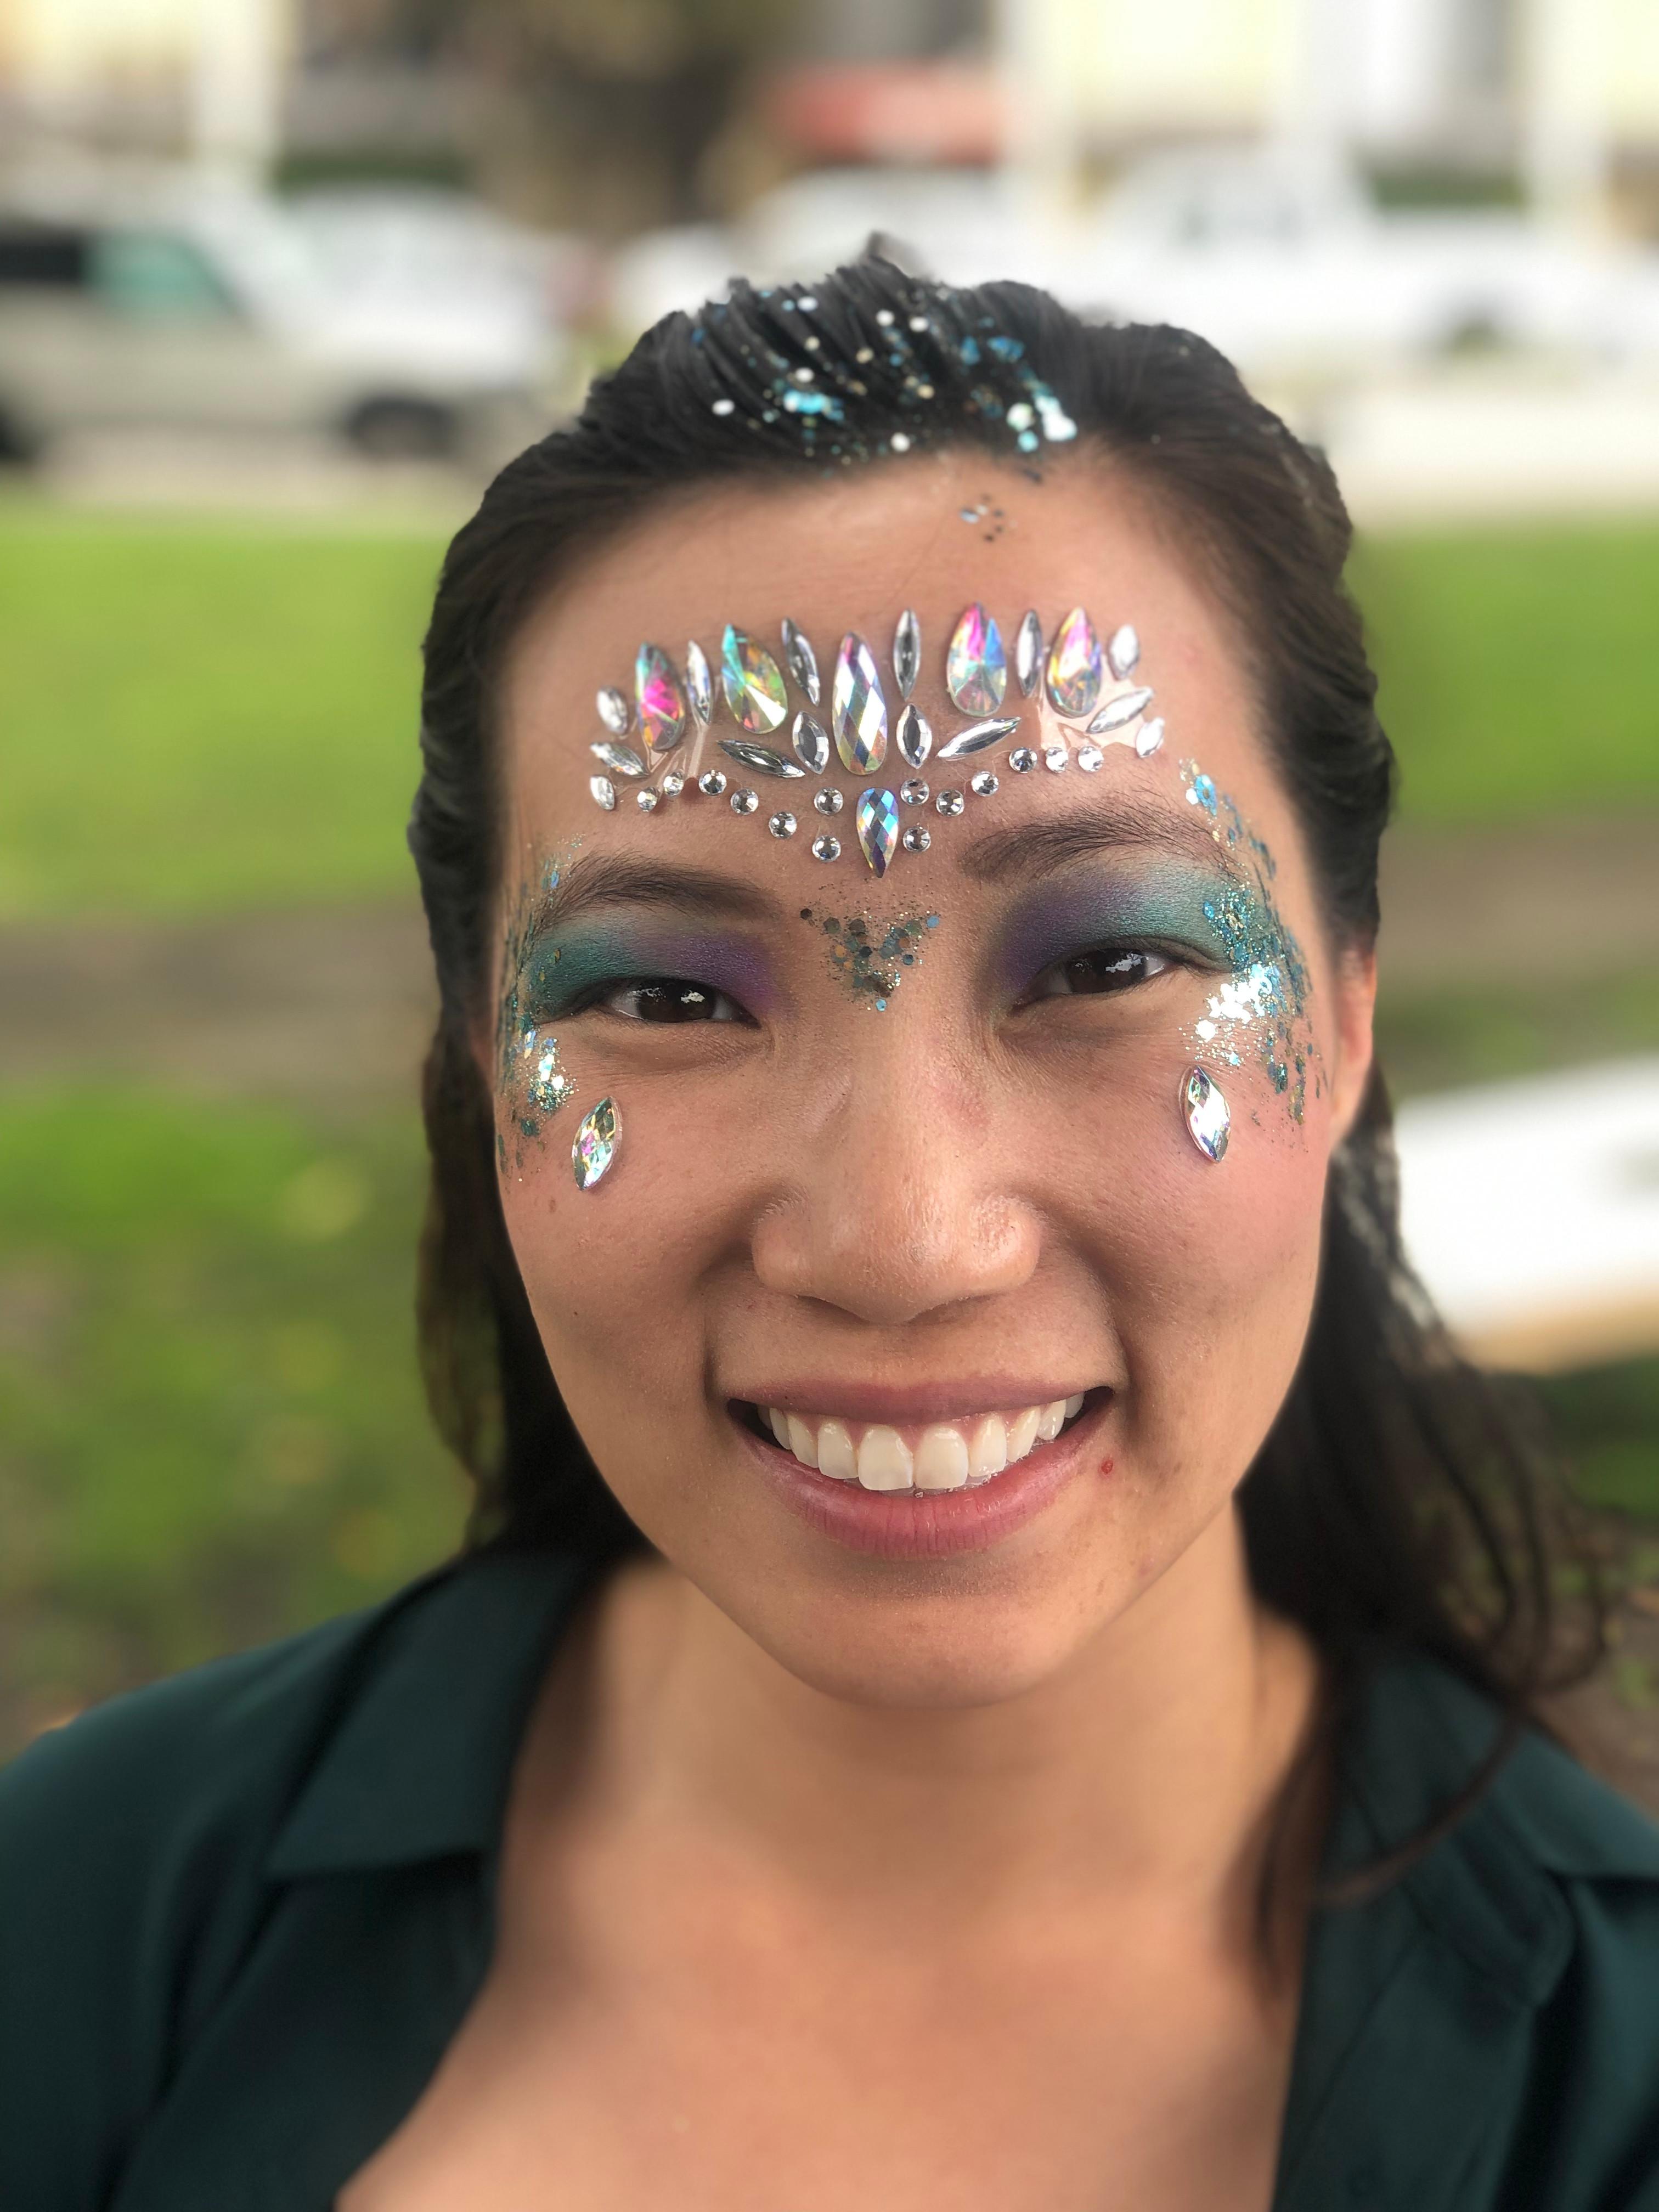 Festival make up+gems Package